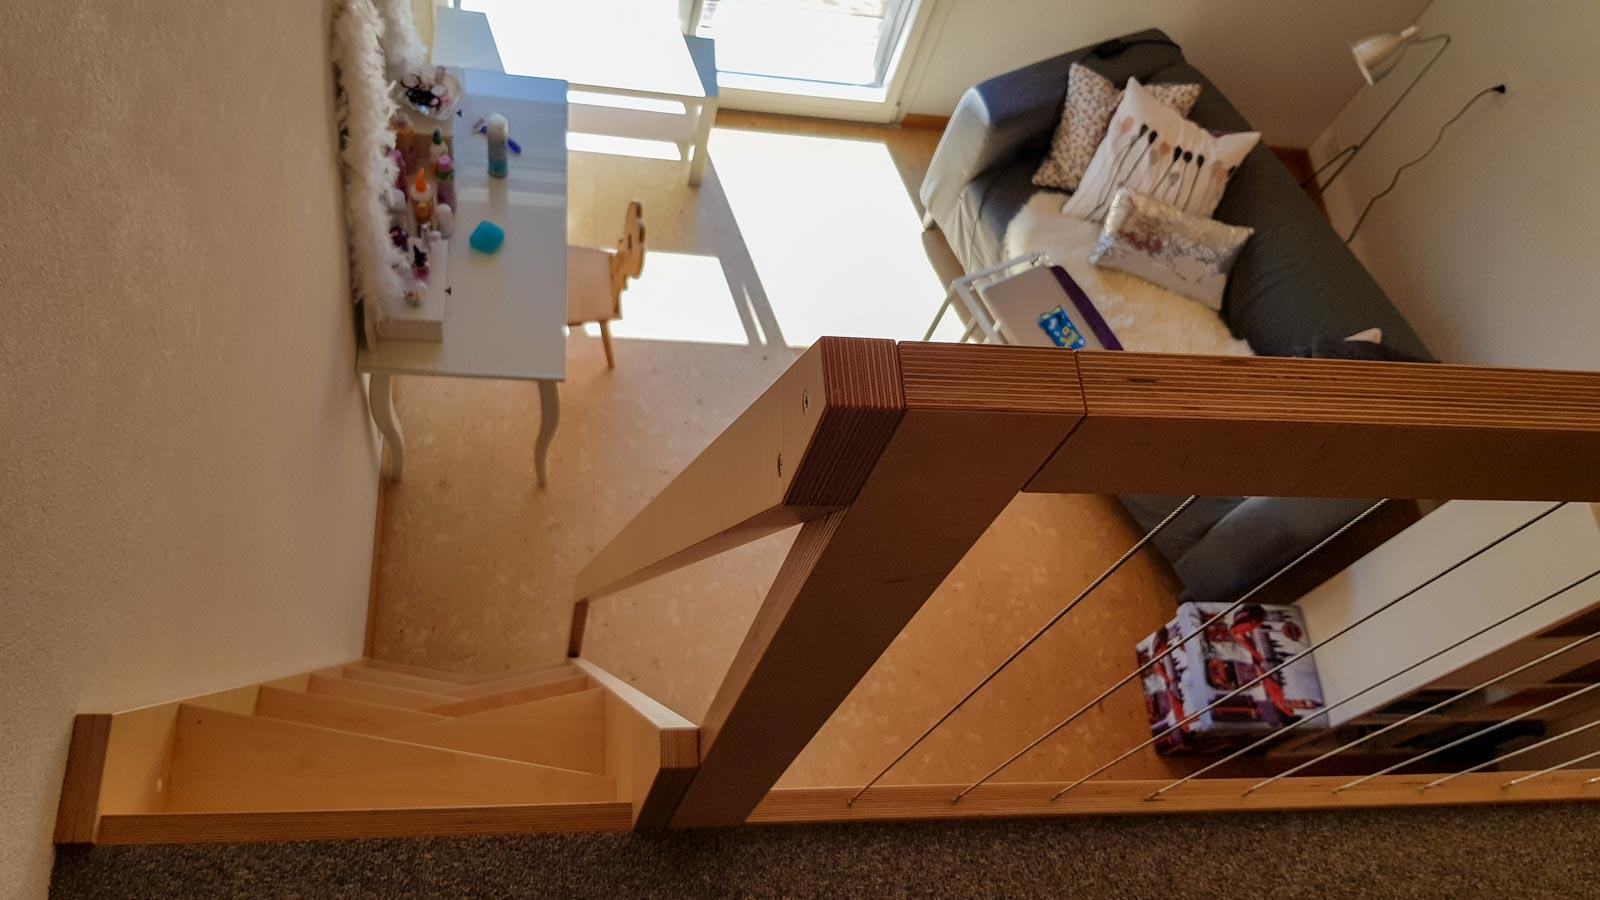 Wooddesign_Jugendzimmer_Jugendbett_Teppe_Schreibtisch-Verstauraum_Hochbbett_Ankleide_Schubladen_Pinwand_Bücherregal (2)